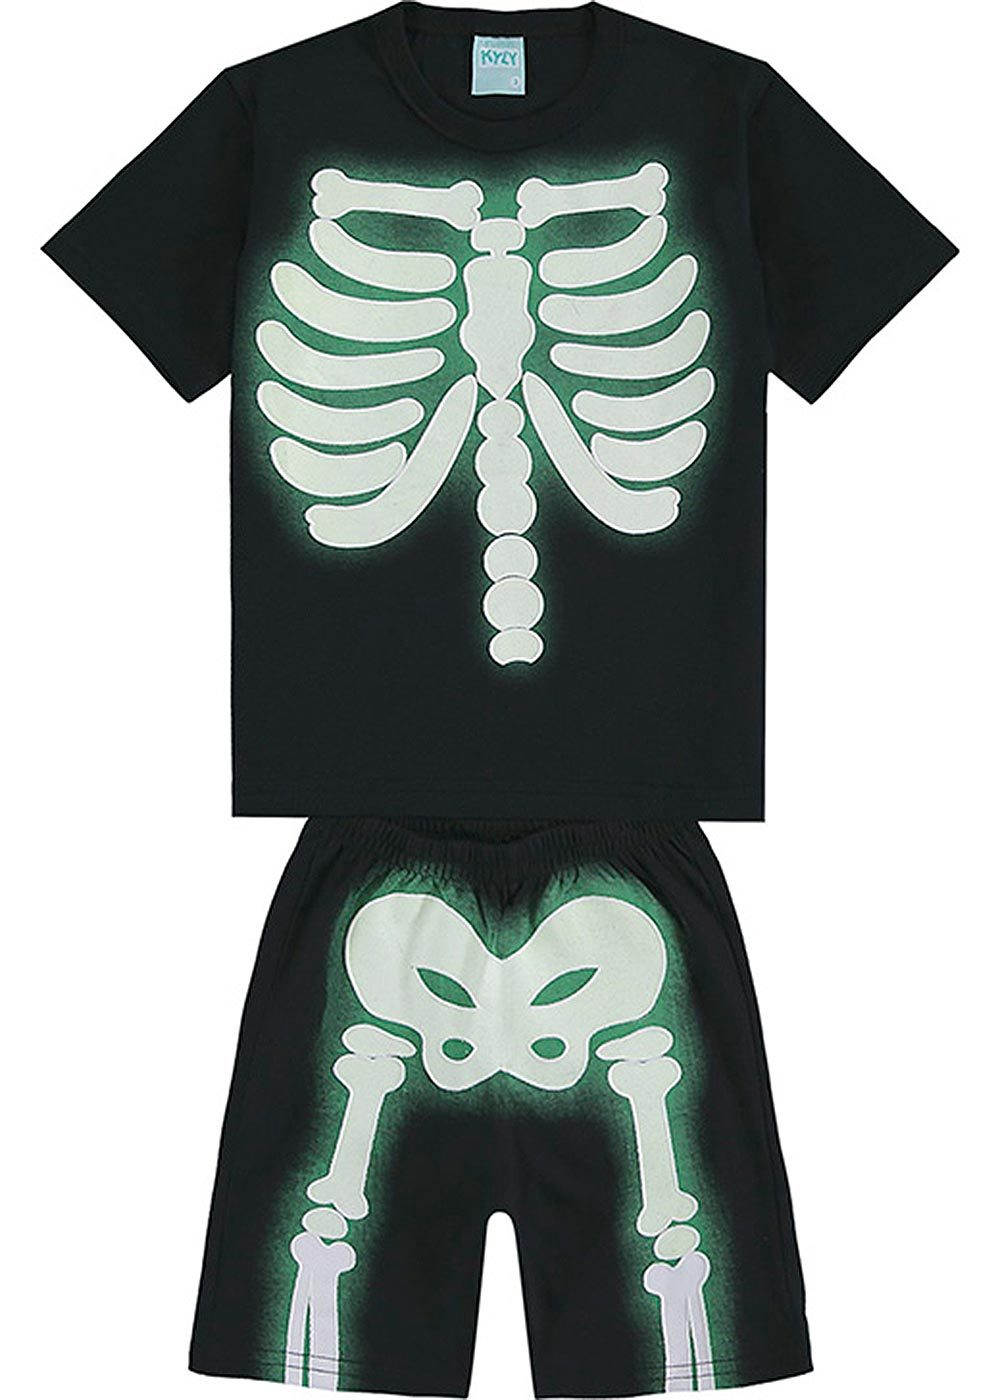 Pijama Infantil Masculino Verão Preto Esqueleto - Kyly